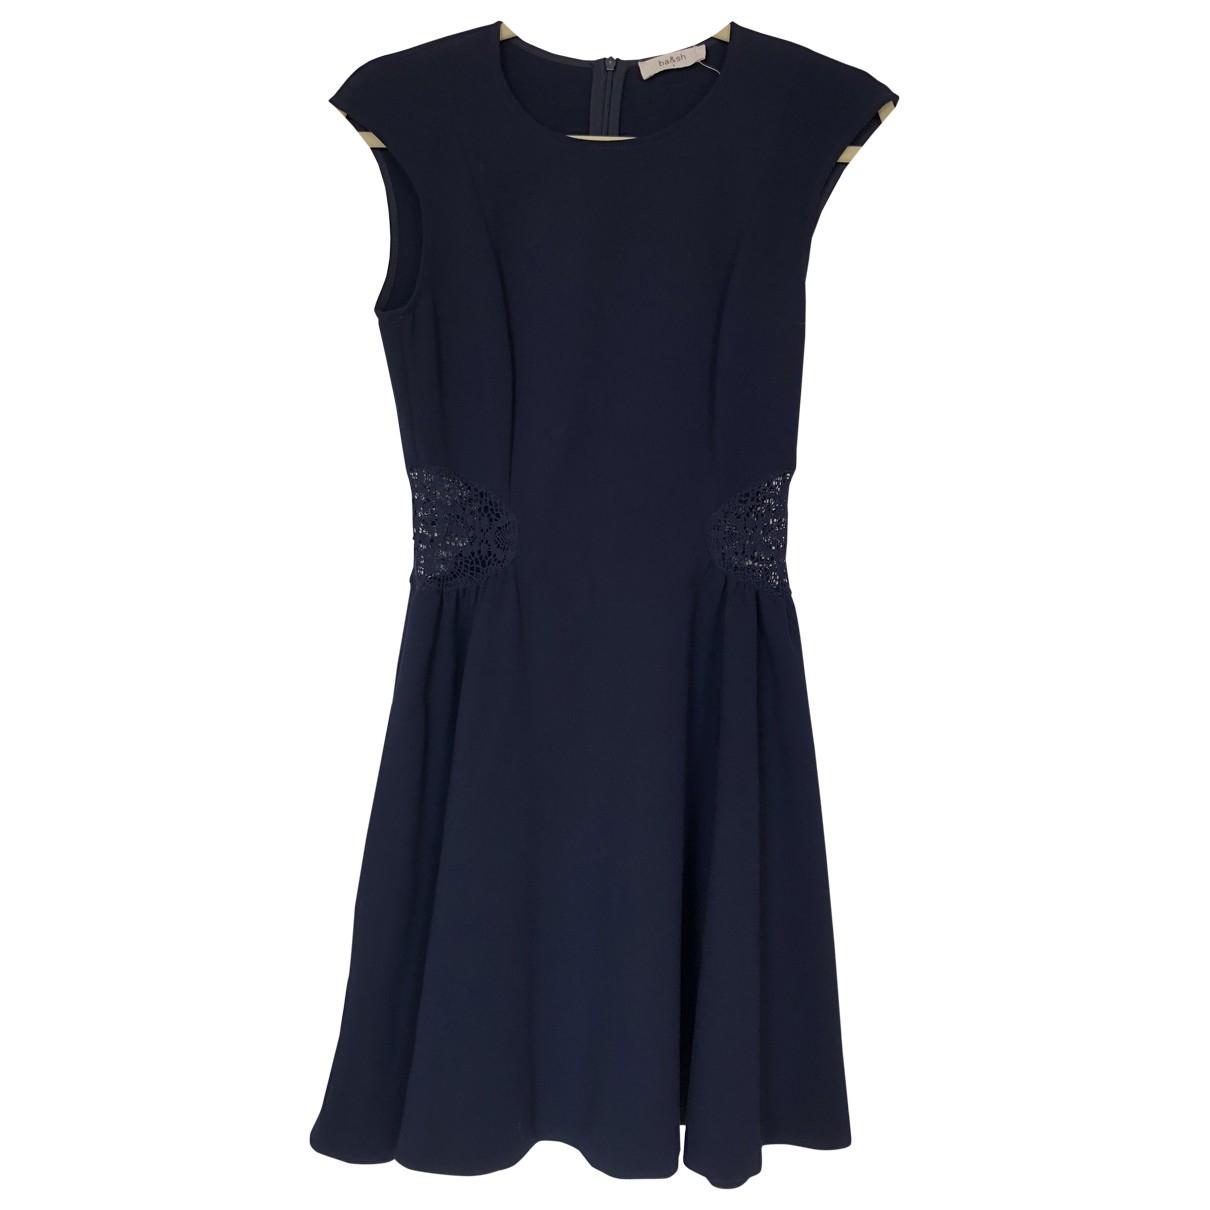 Ba&sh \N Navy dress for Women 1 0-5